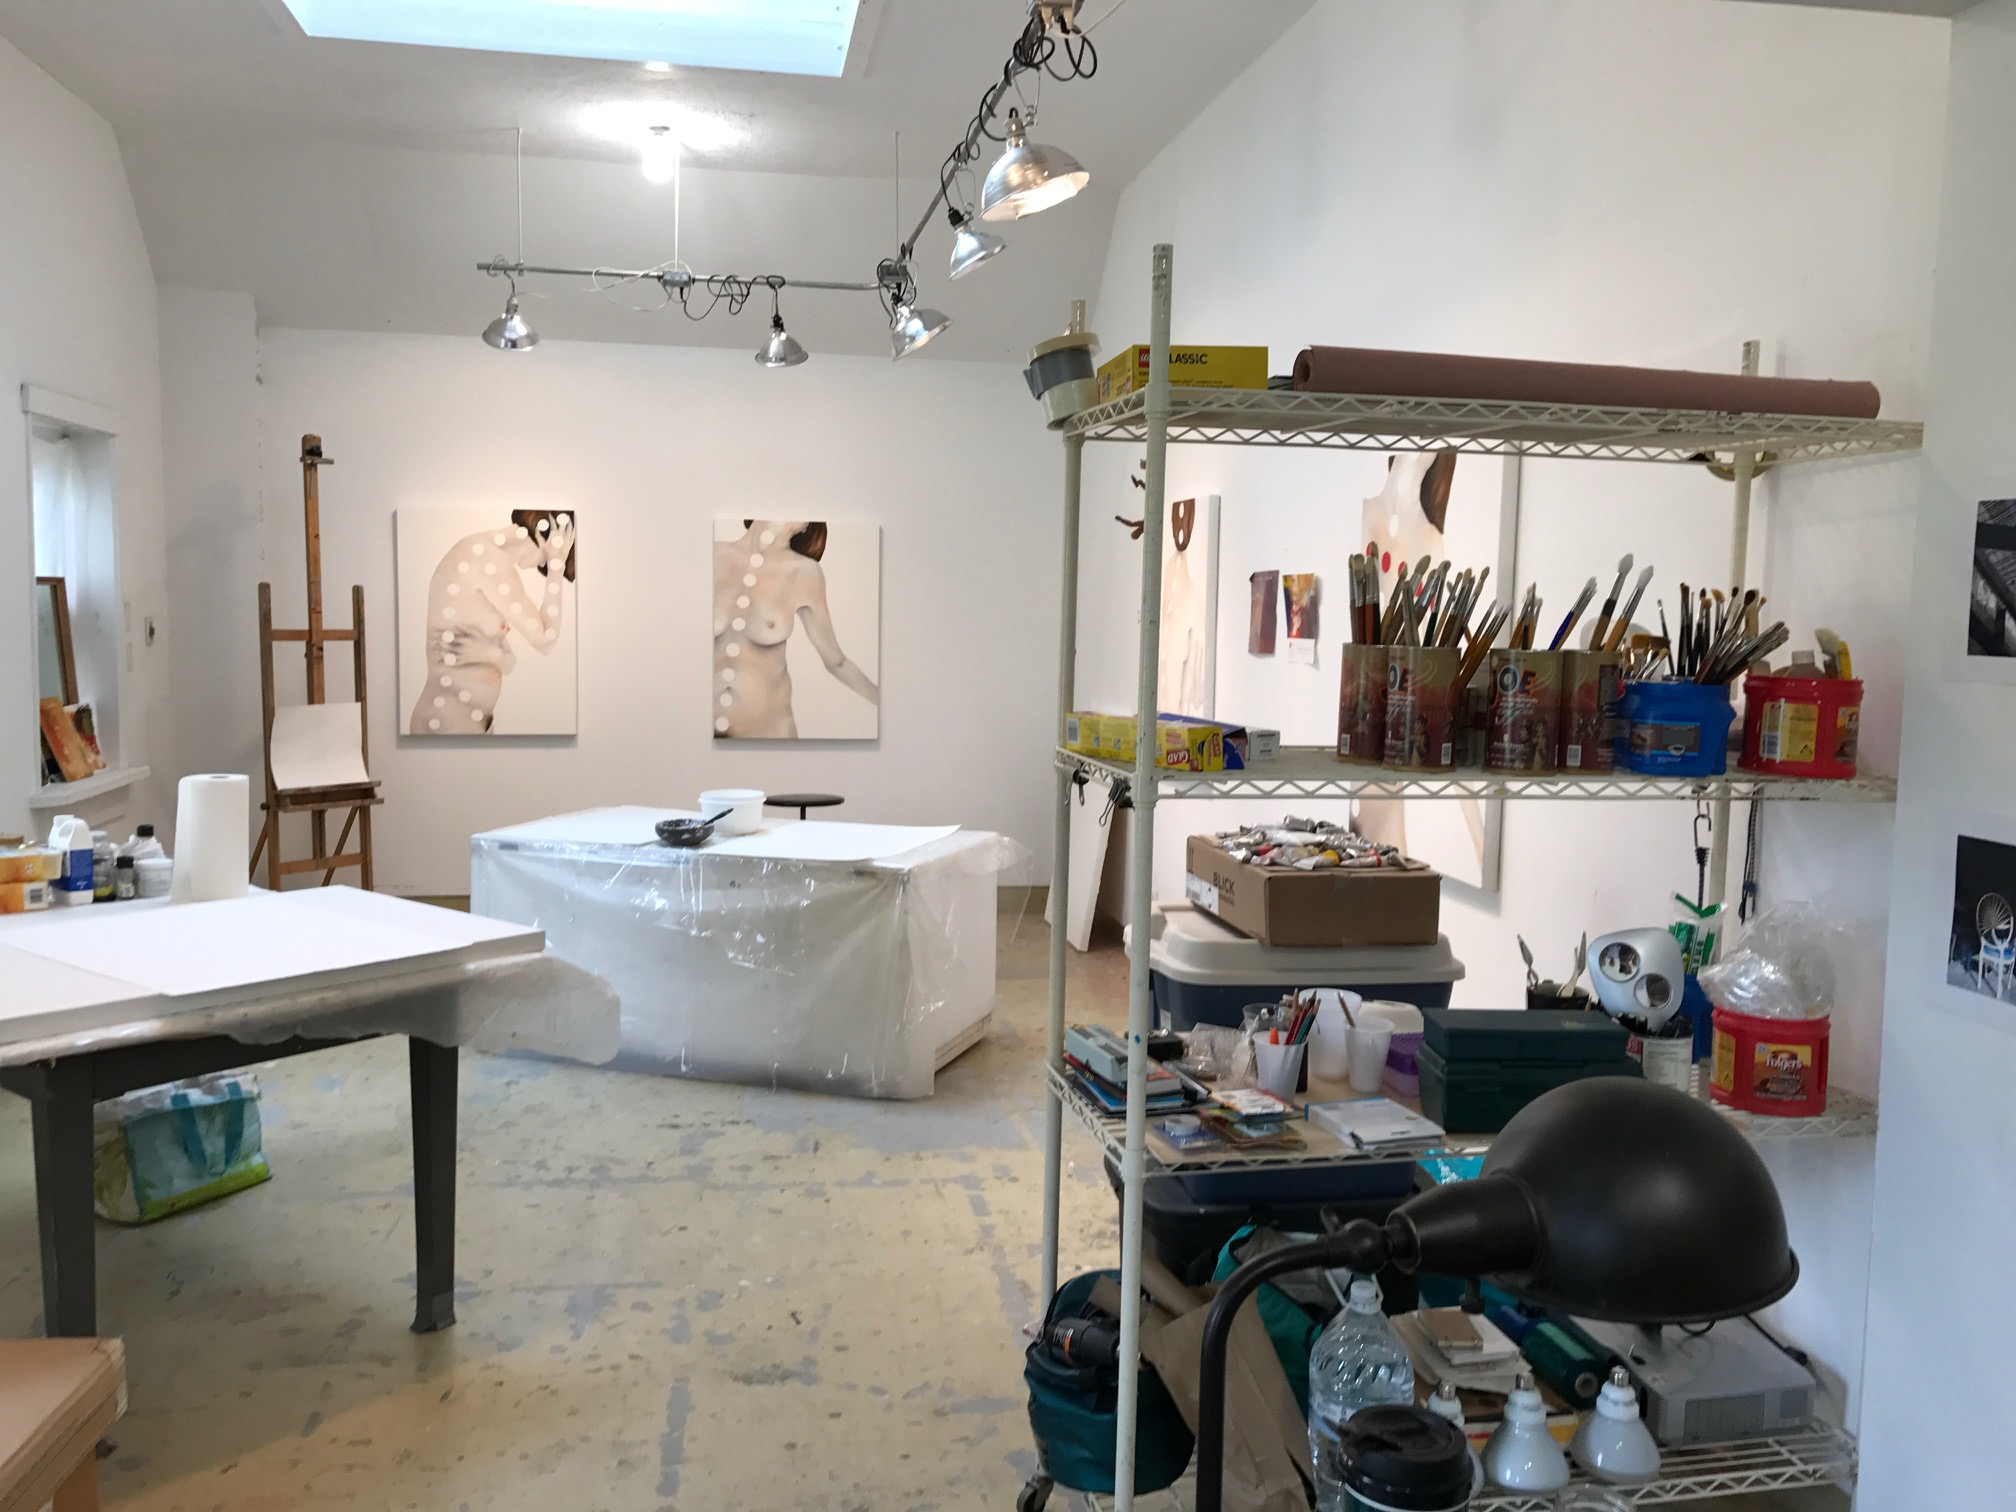 Colleen Garibaldi's studio